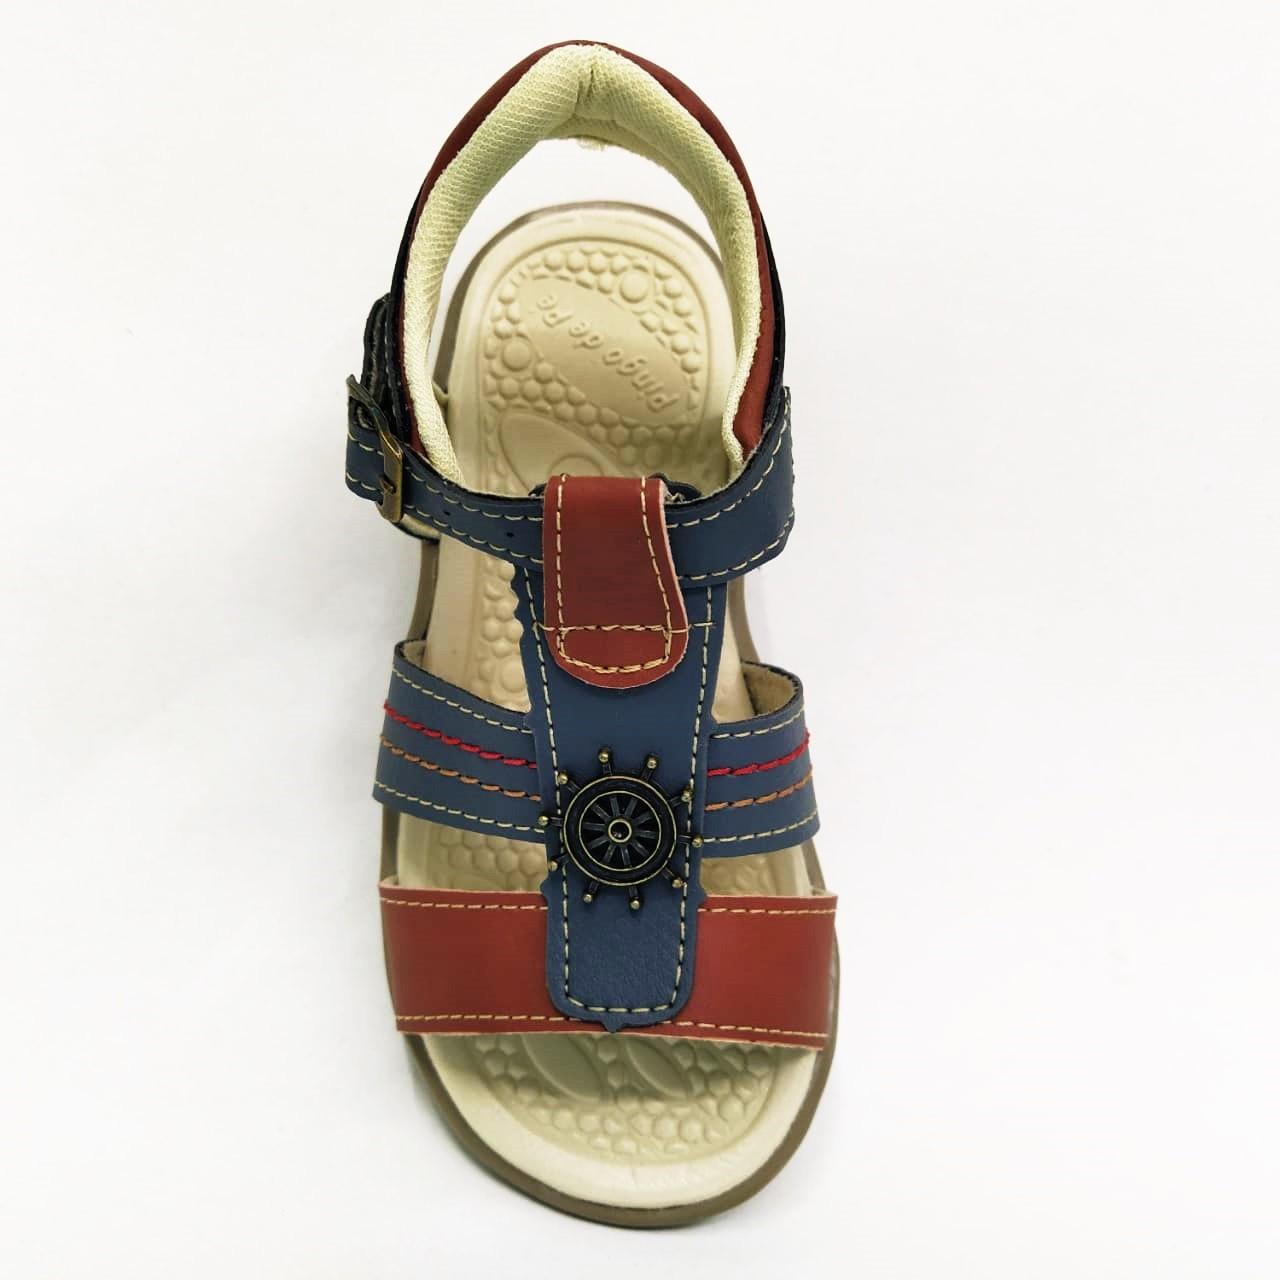 Sandalia Infantil Masculina Pingo de Pé 1393-884 - Cinza/Telha